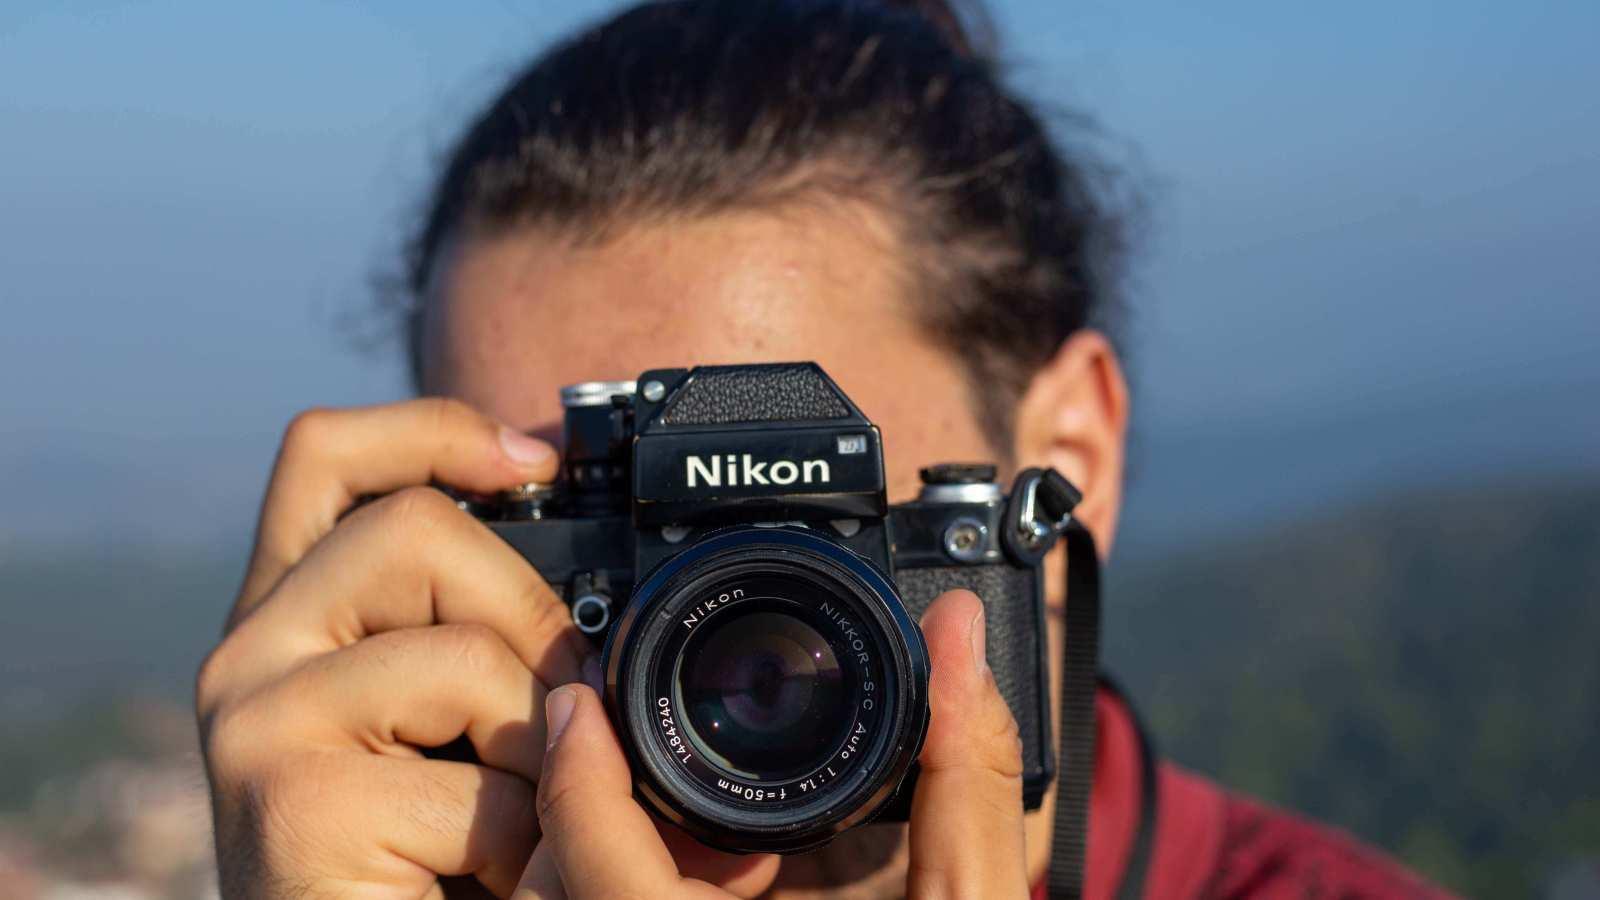 Kamera Lebensdauer